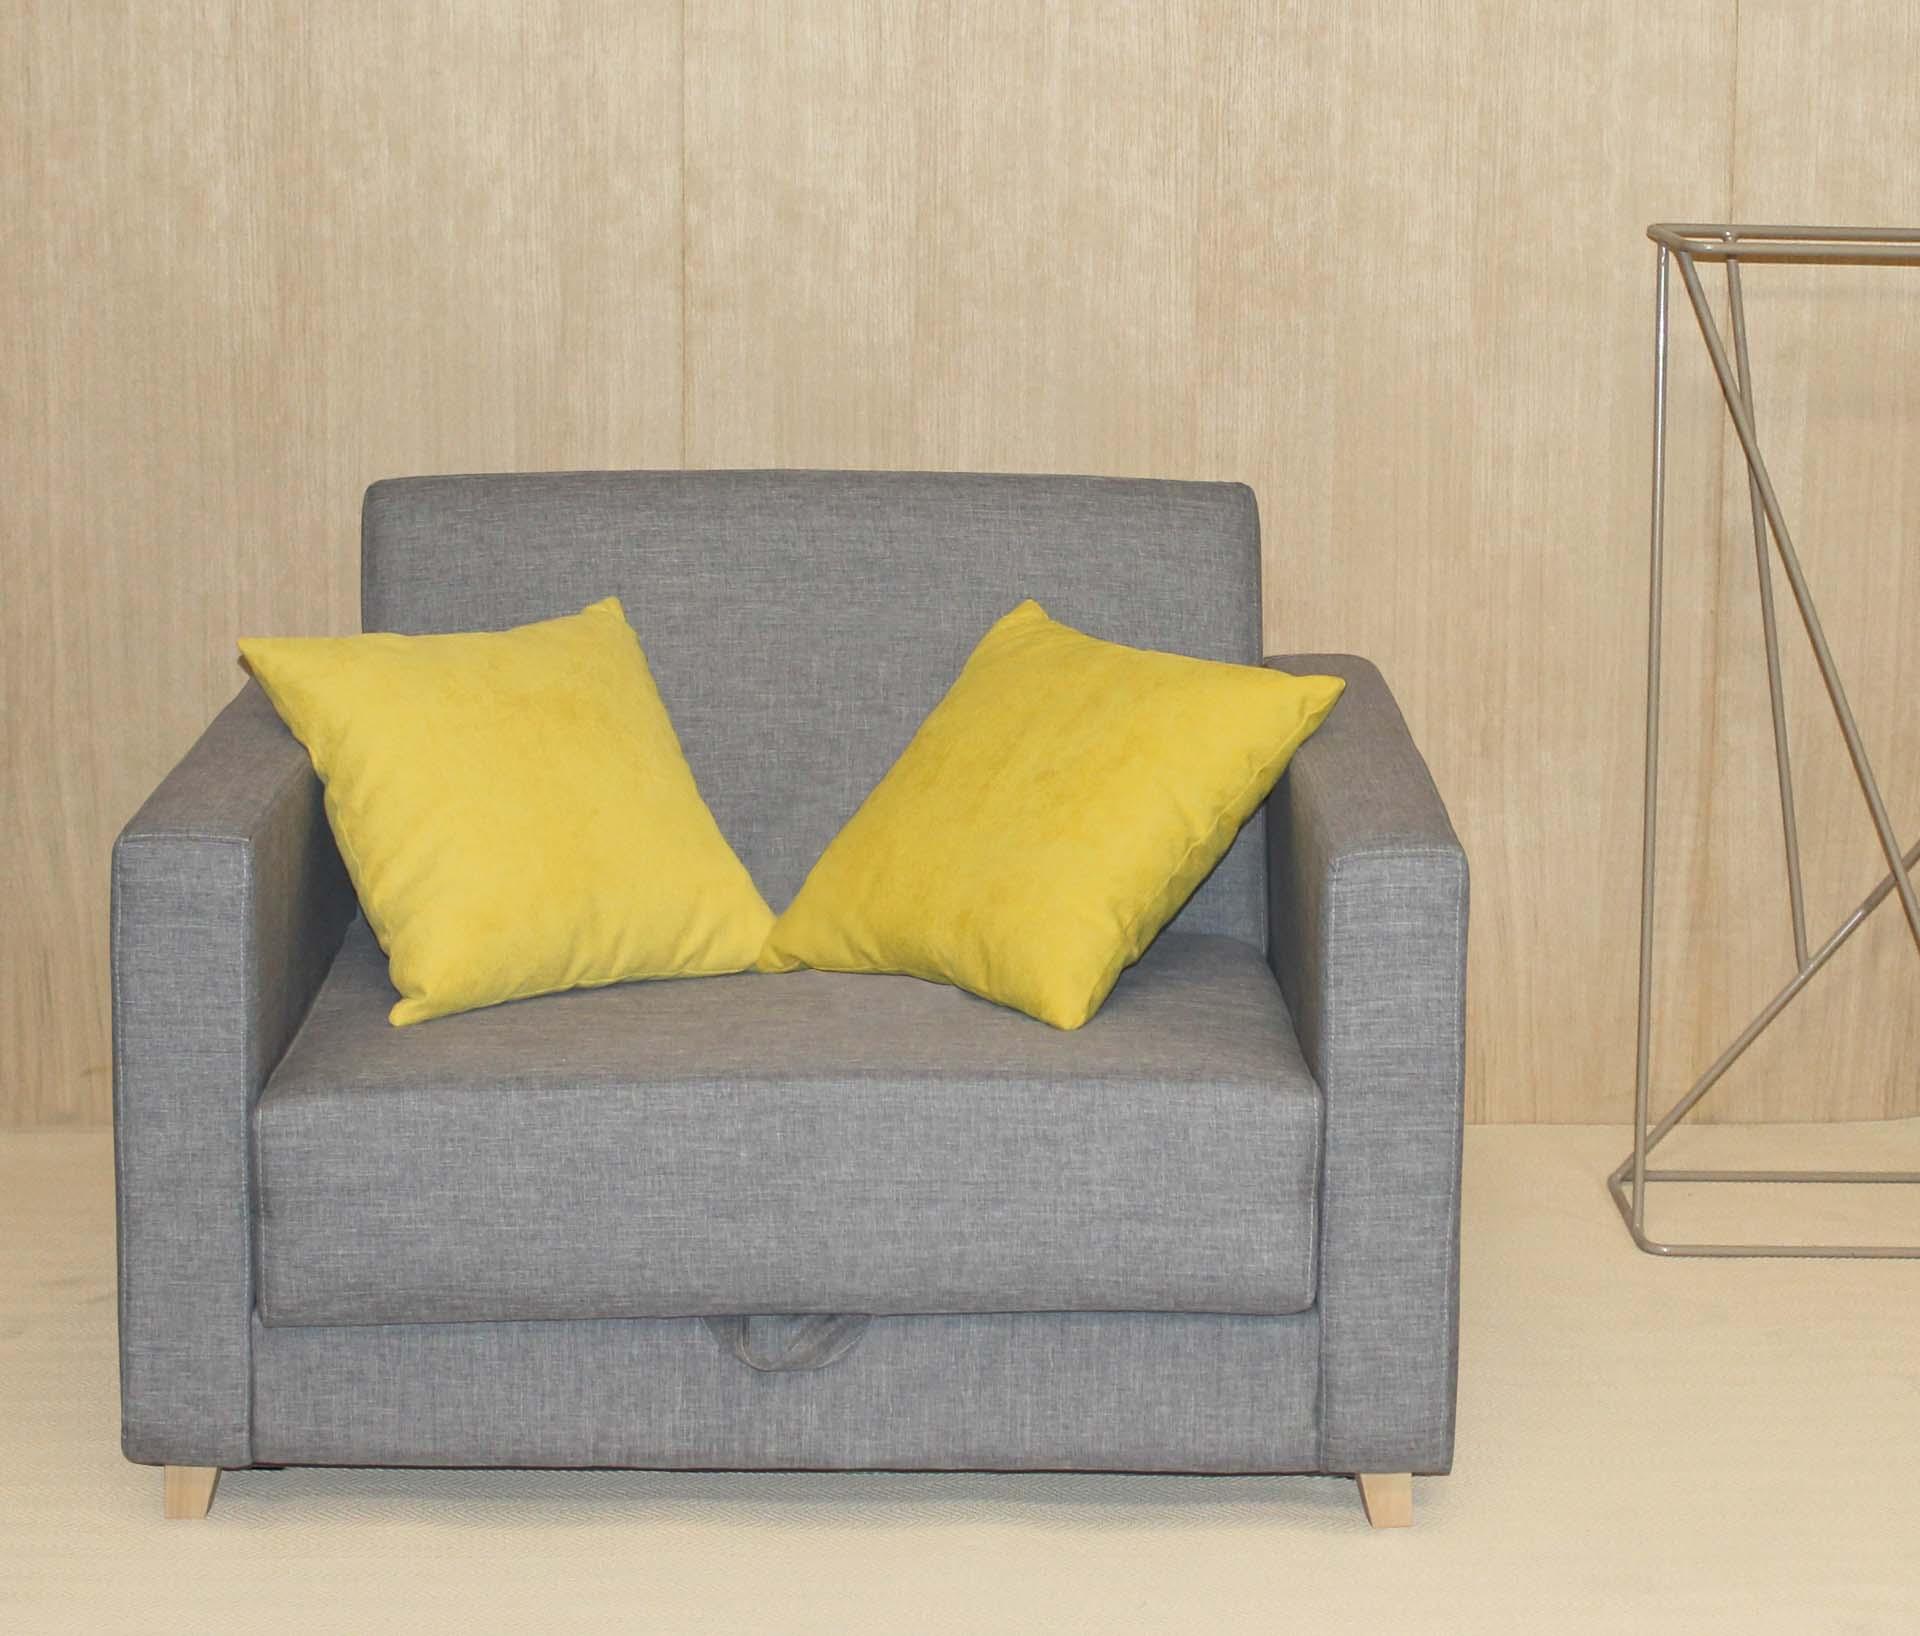 Sofá cama geriatría con mecanismo de apertura fácil de SENIORCARE